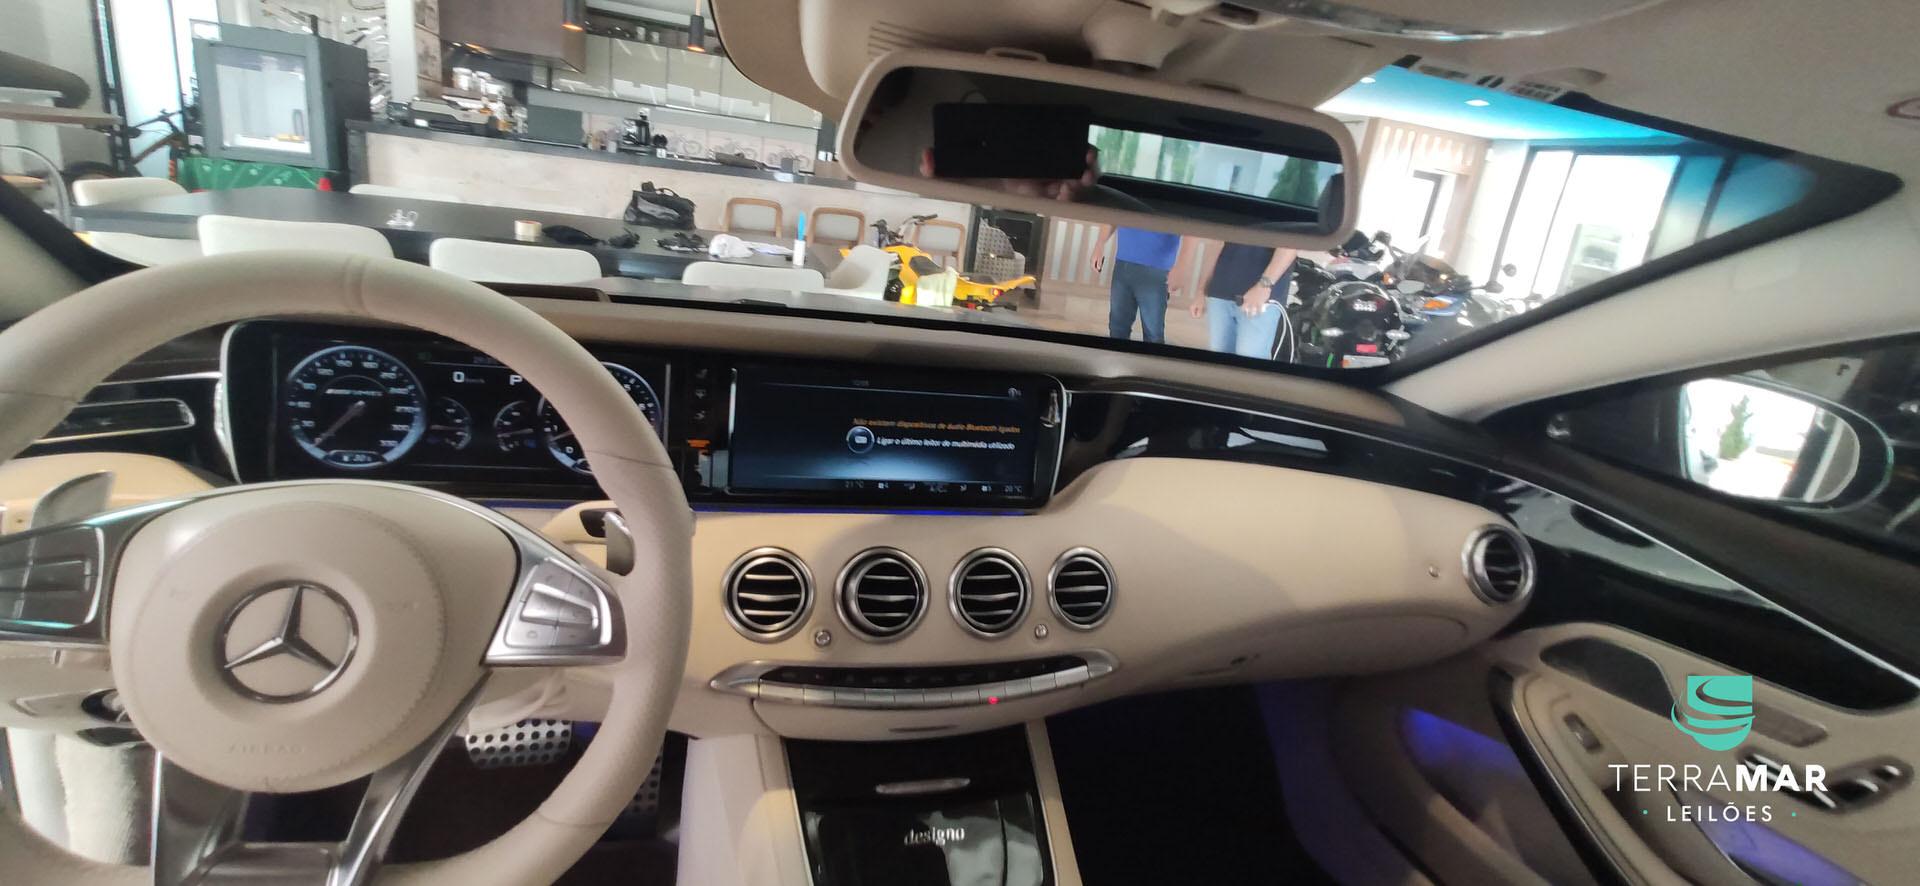 MERCEDES BENZ S63 AMG BLINDADA